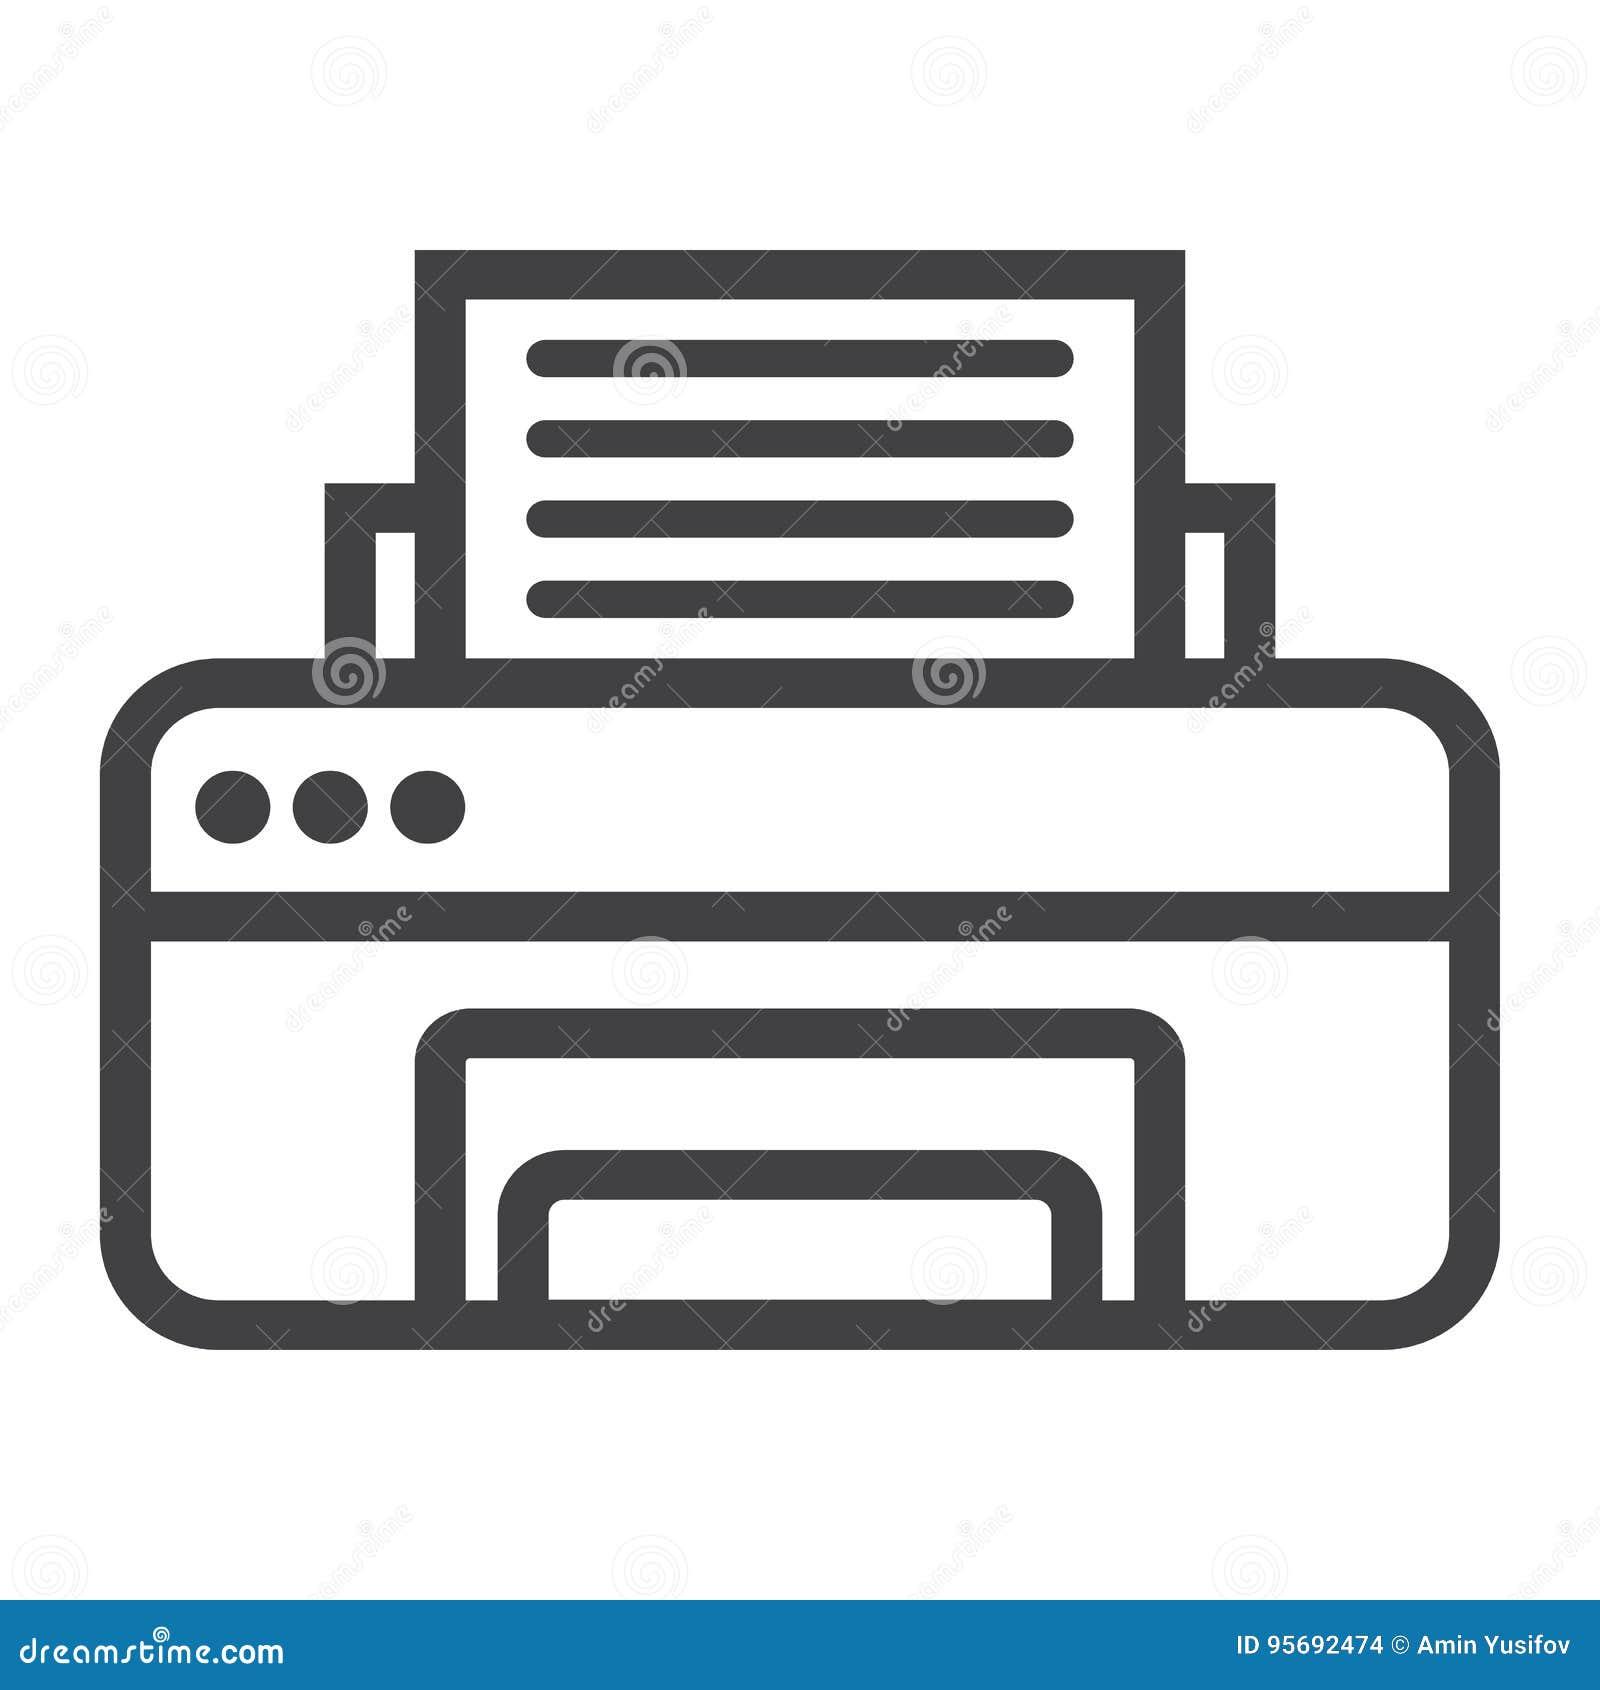 Drukarki kreskowa ikona, faks i biuro, wektor